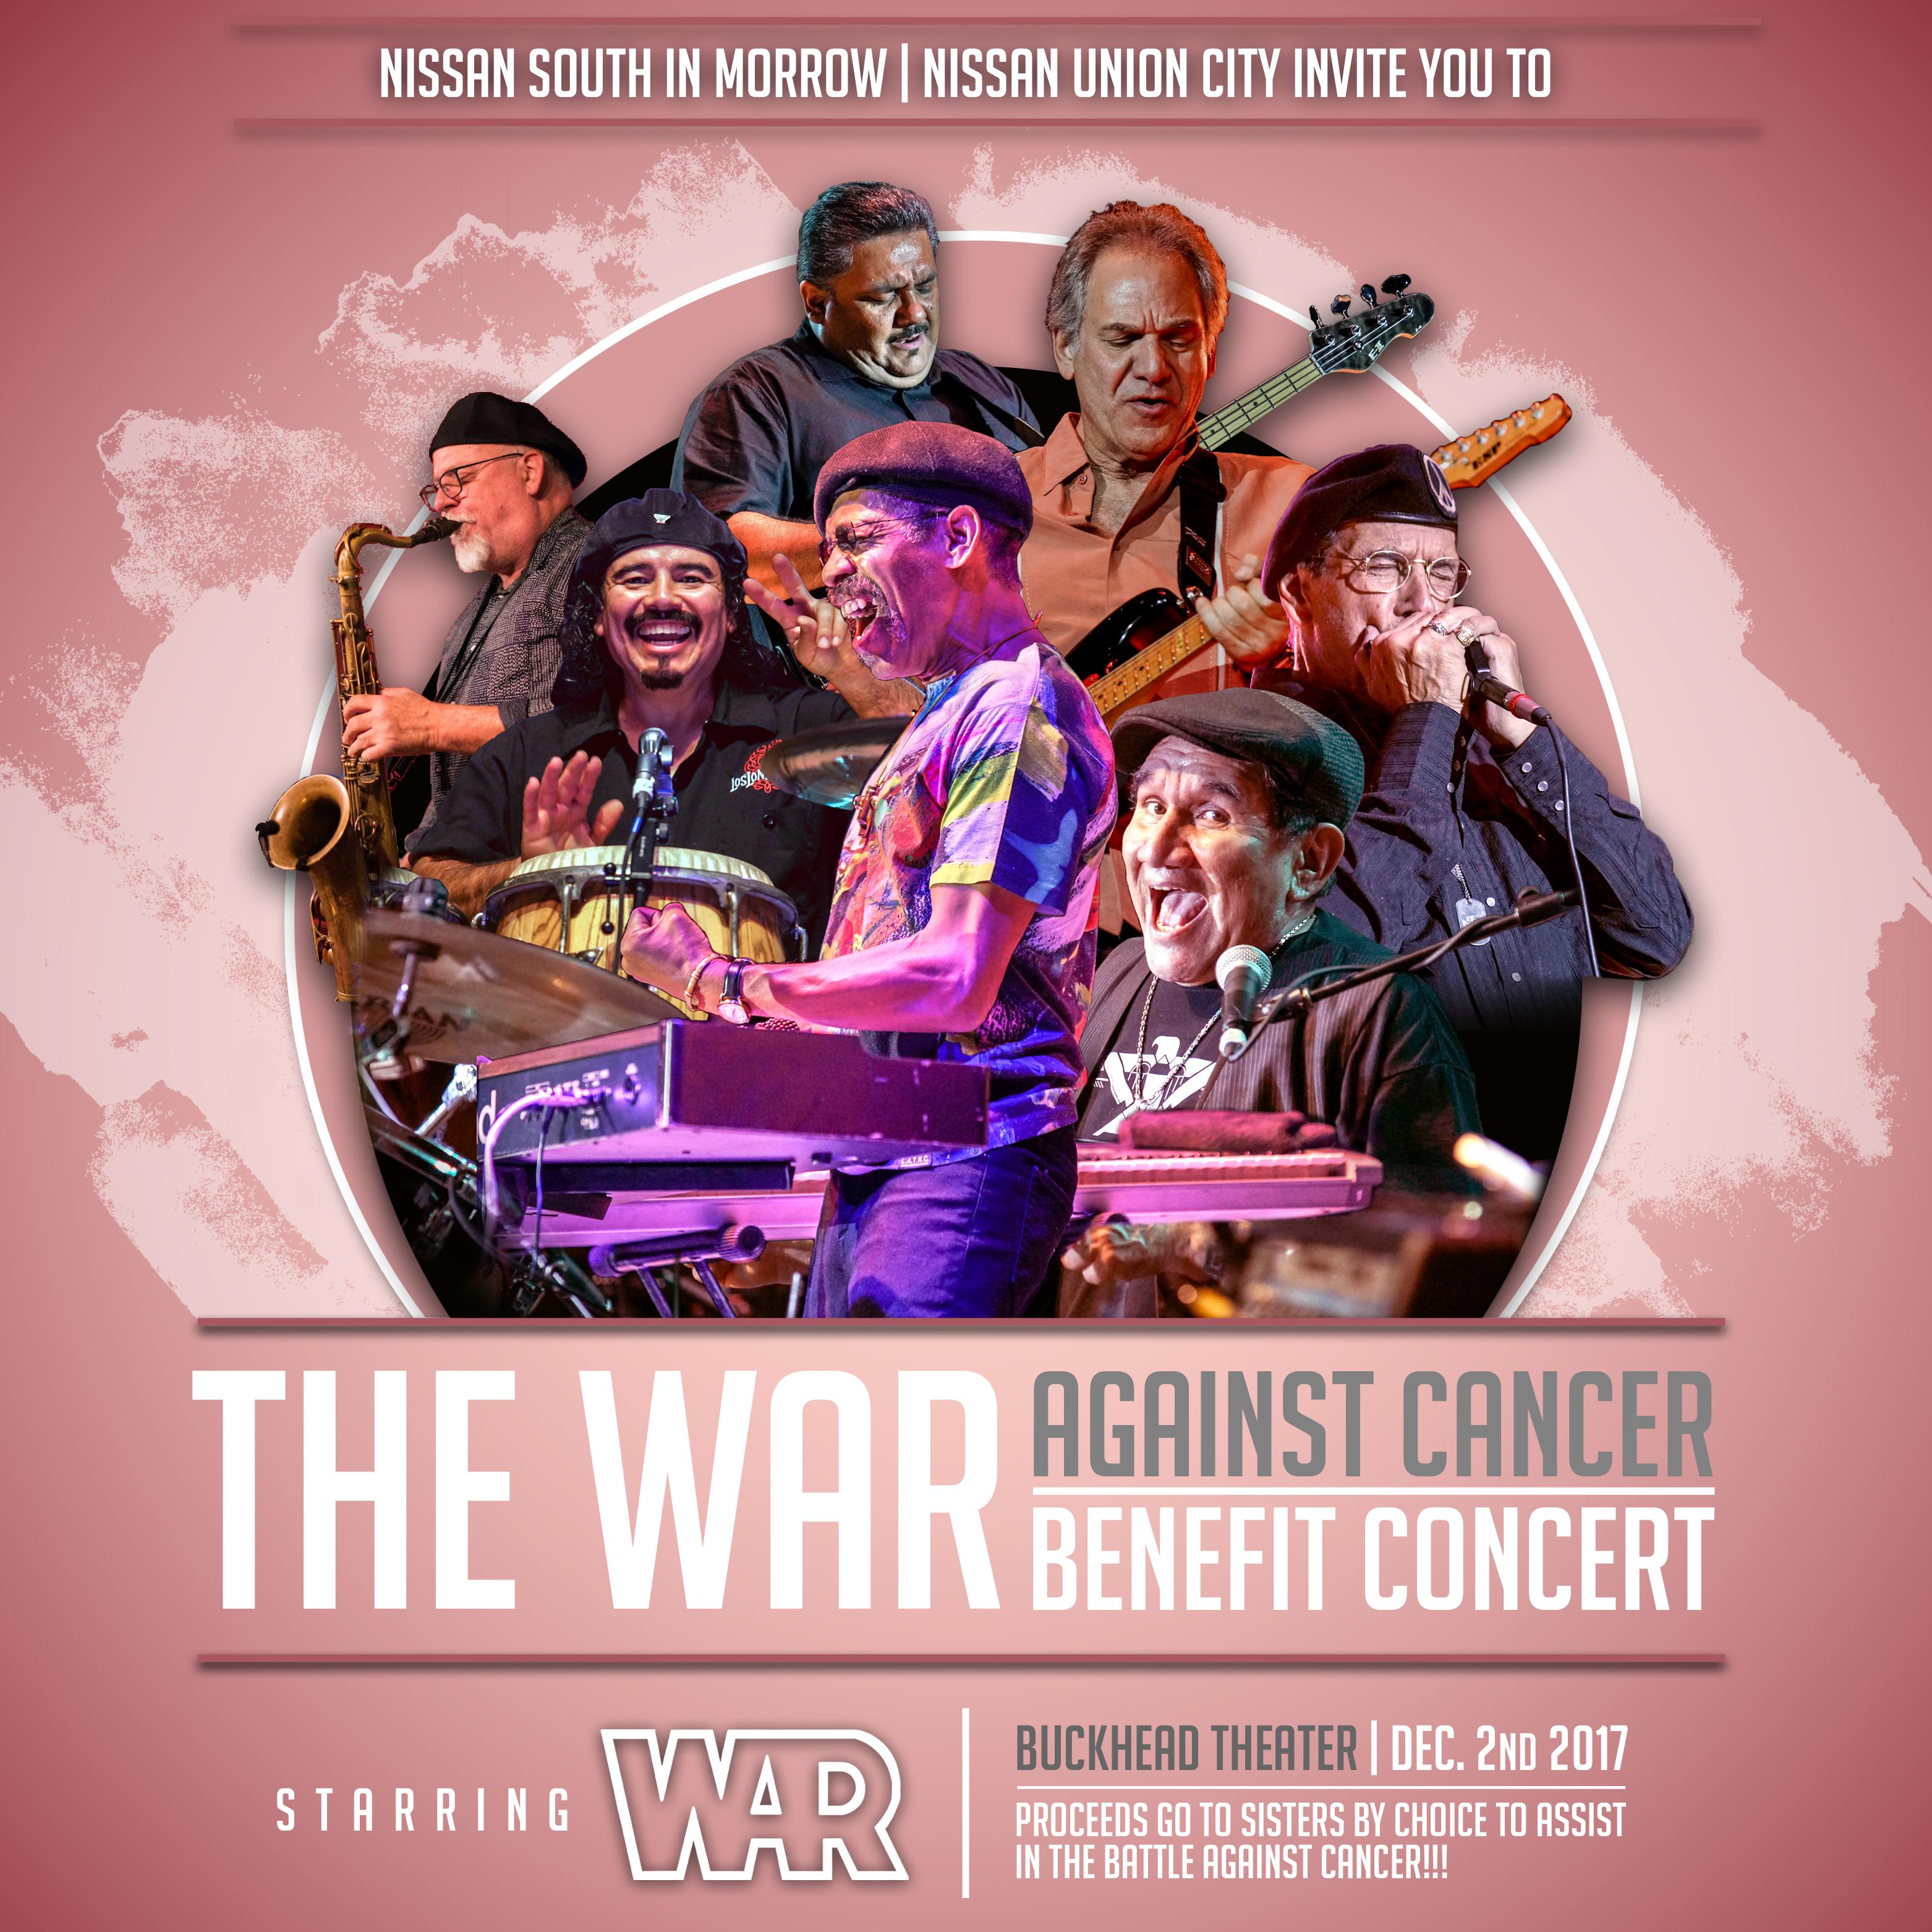 The War Against Cancer Benefit Concert